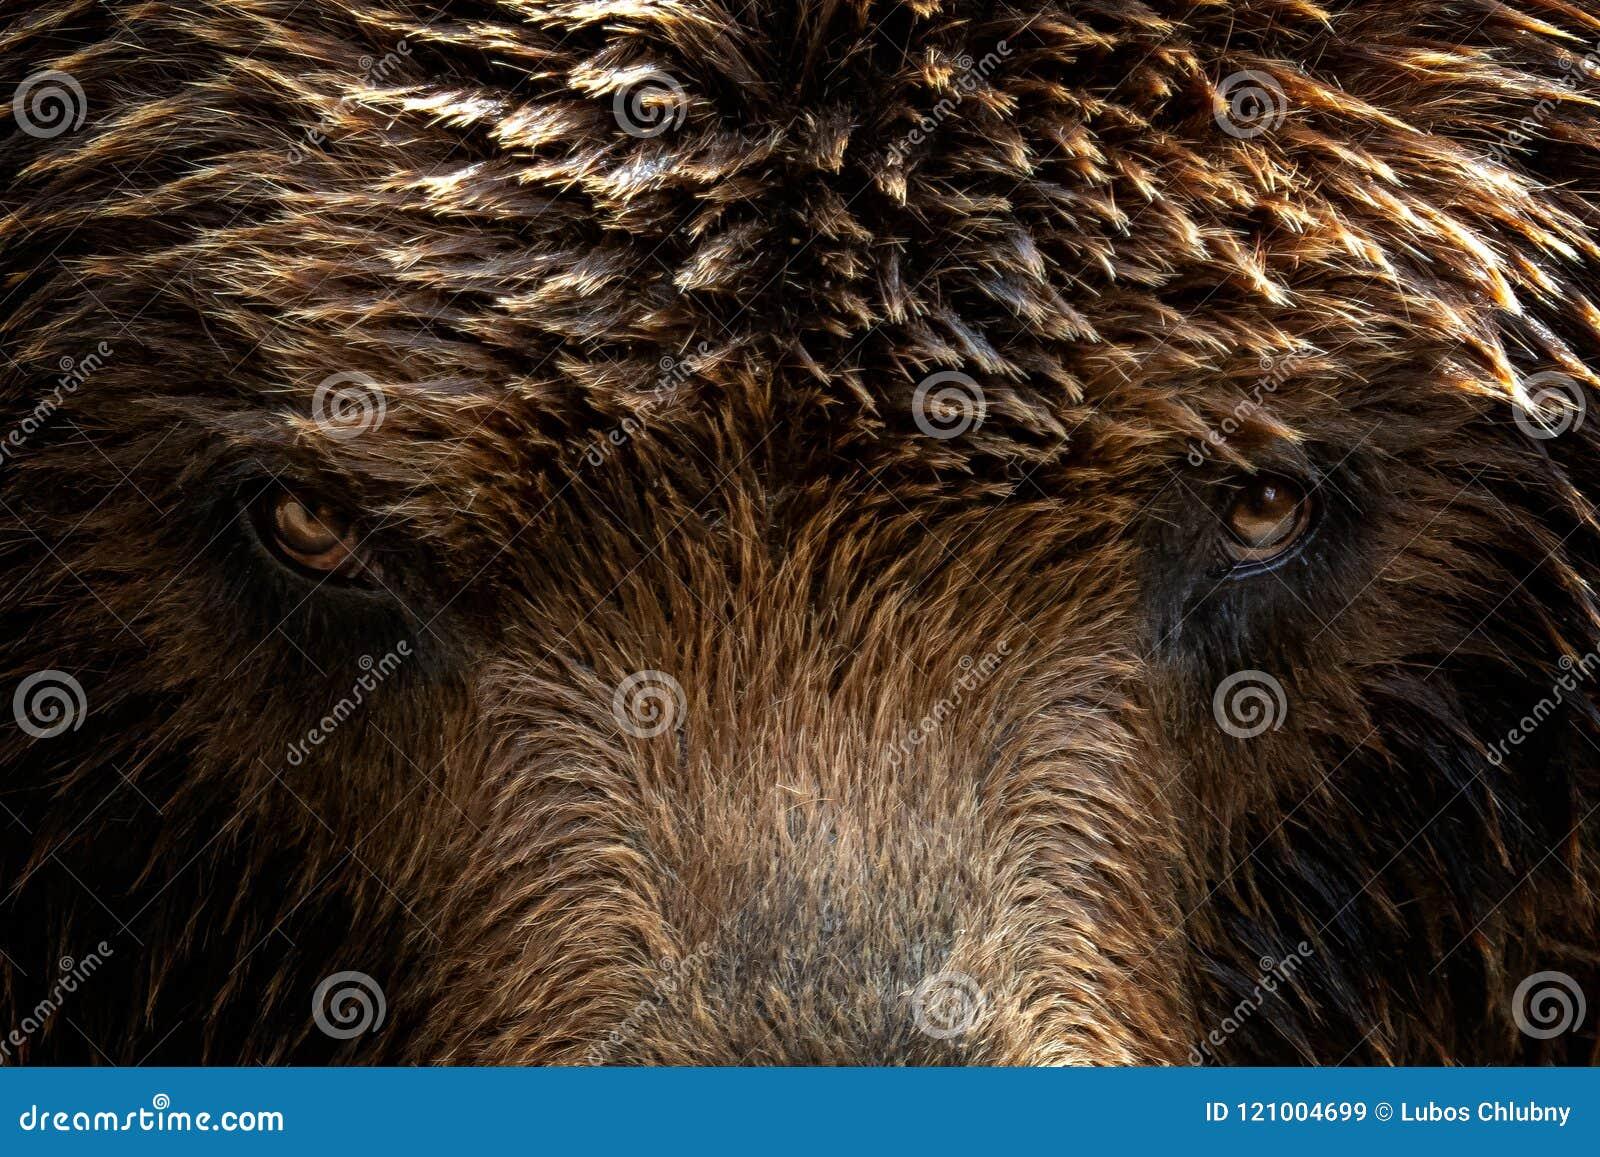 Kamchatka Brown bear Ursus arctos beringianus